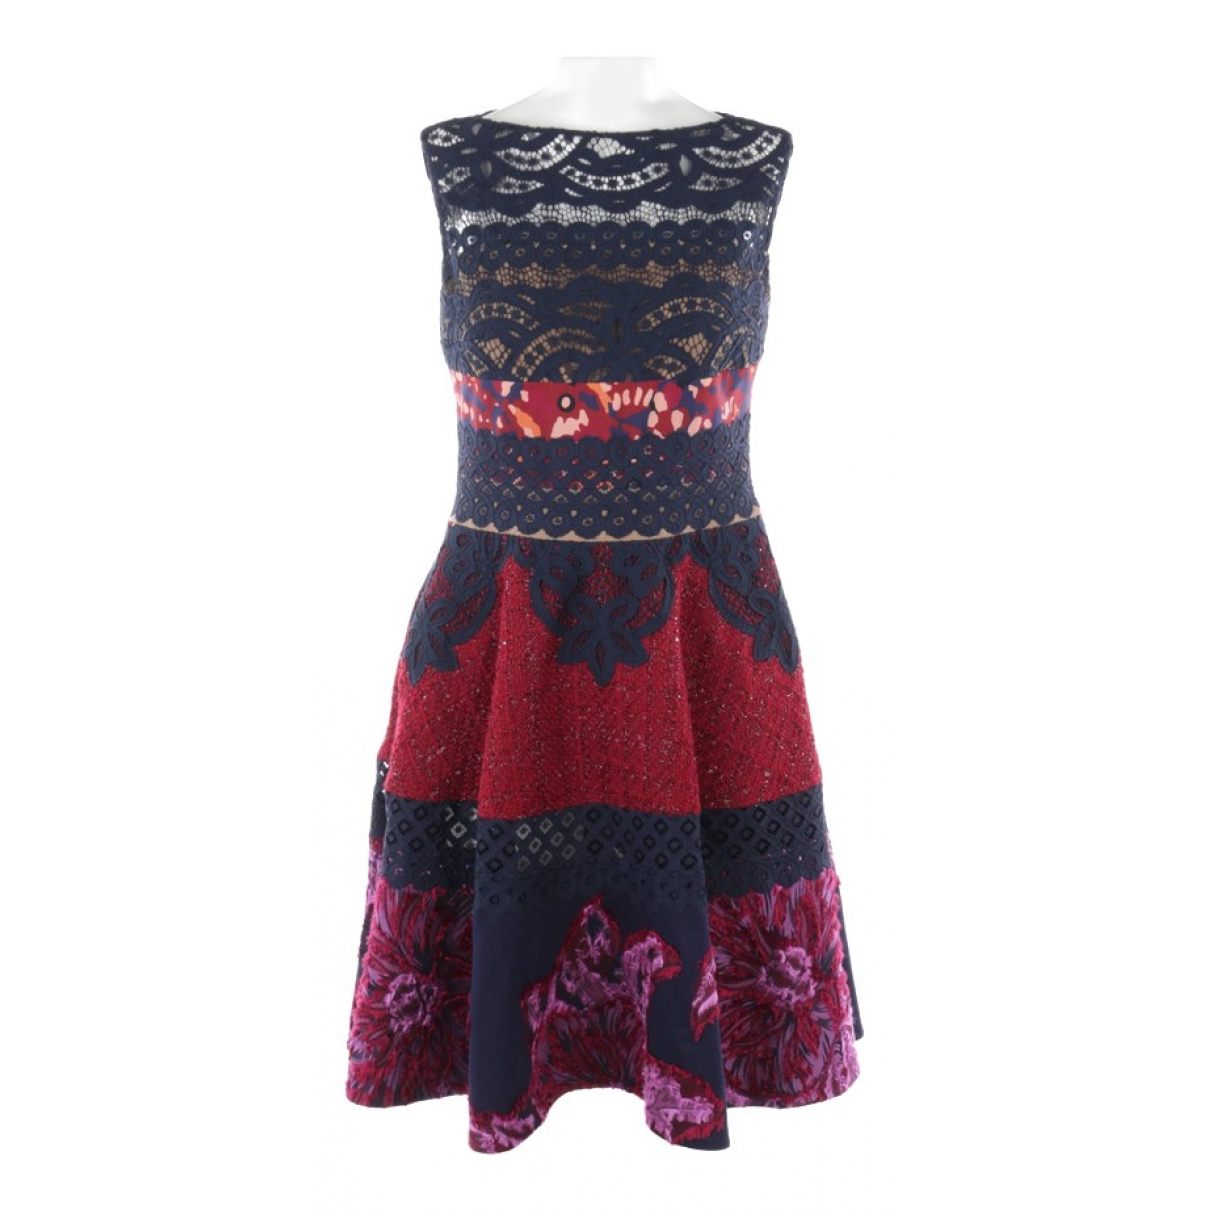 Talbot Runhof \N Multicolour Cotton dress for Women XS International